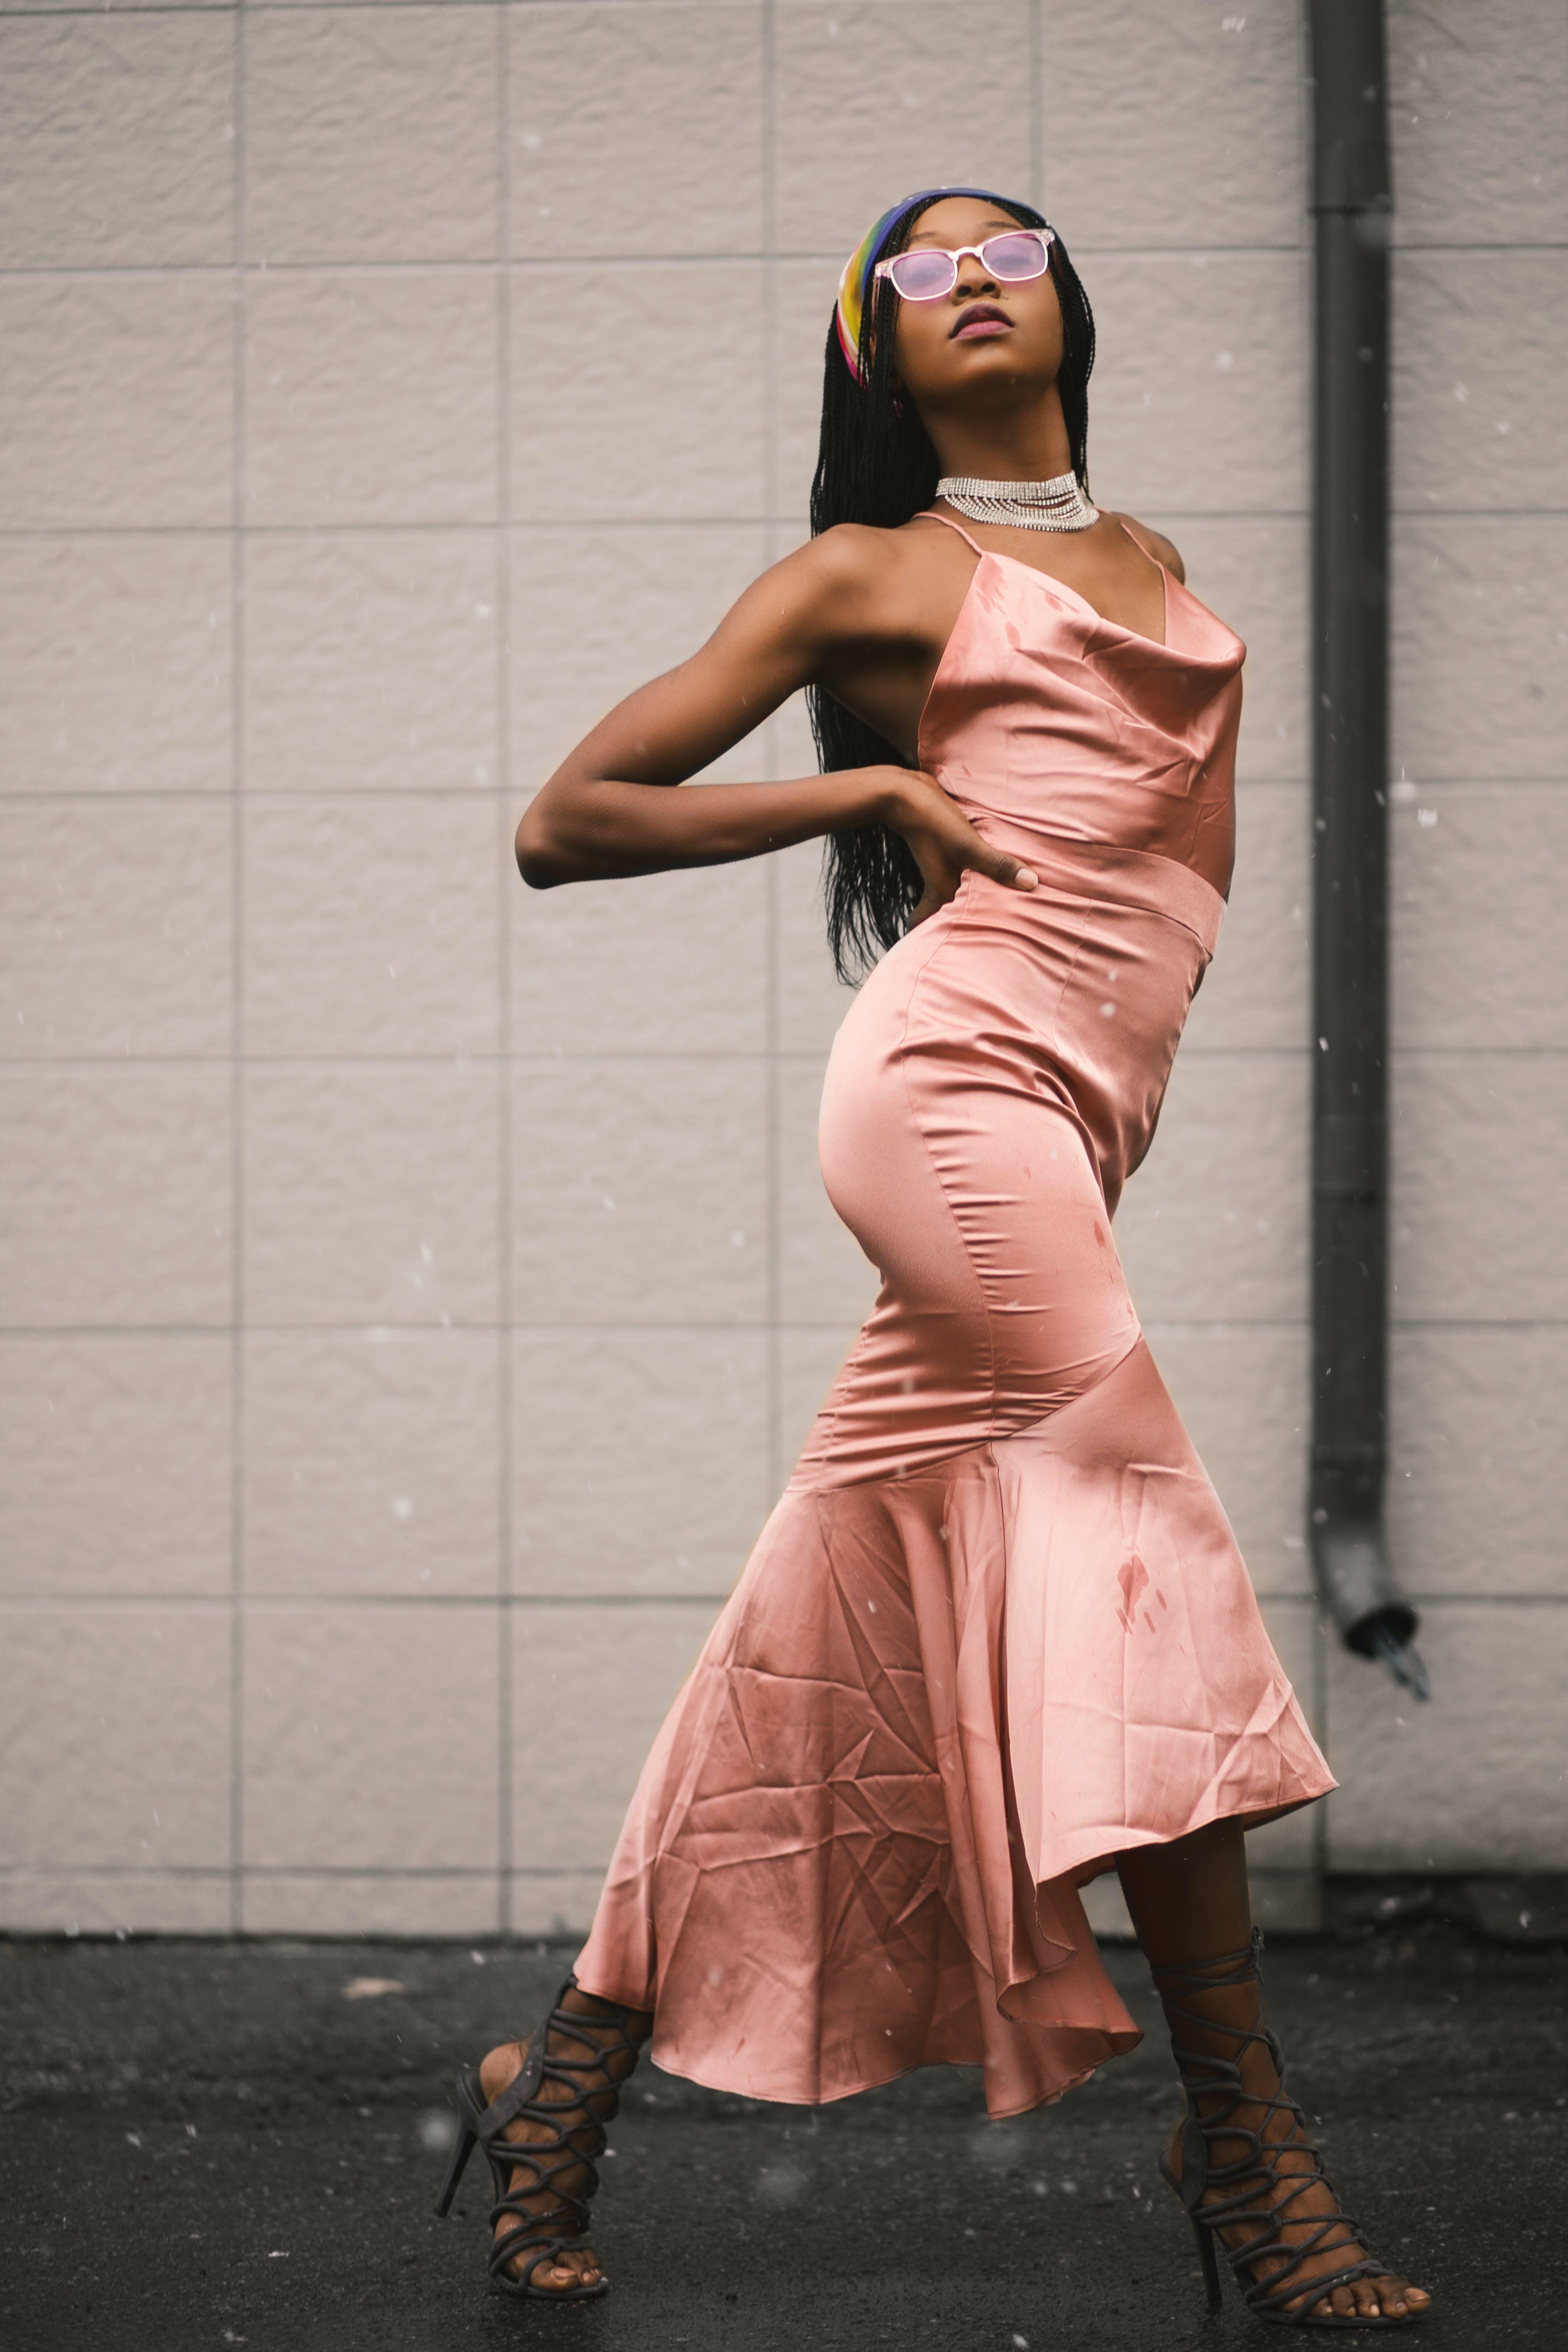 Woman in Pink Spaghetti Strap Dress